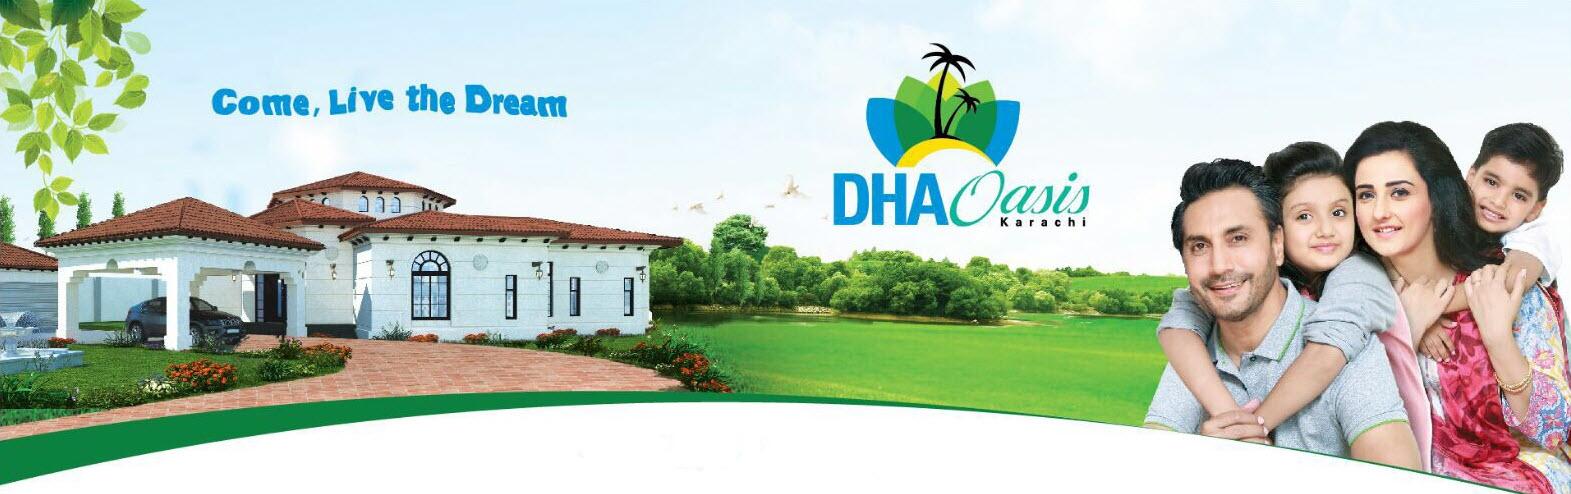 dha-oasis-karachi-background